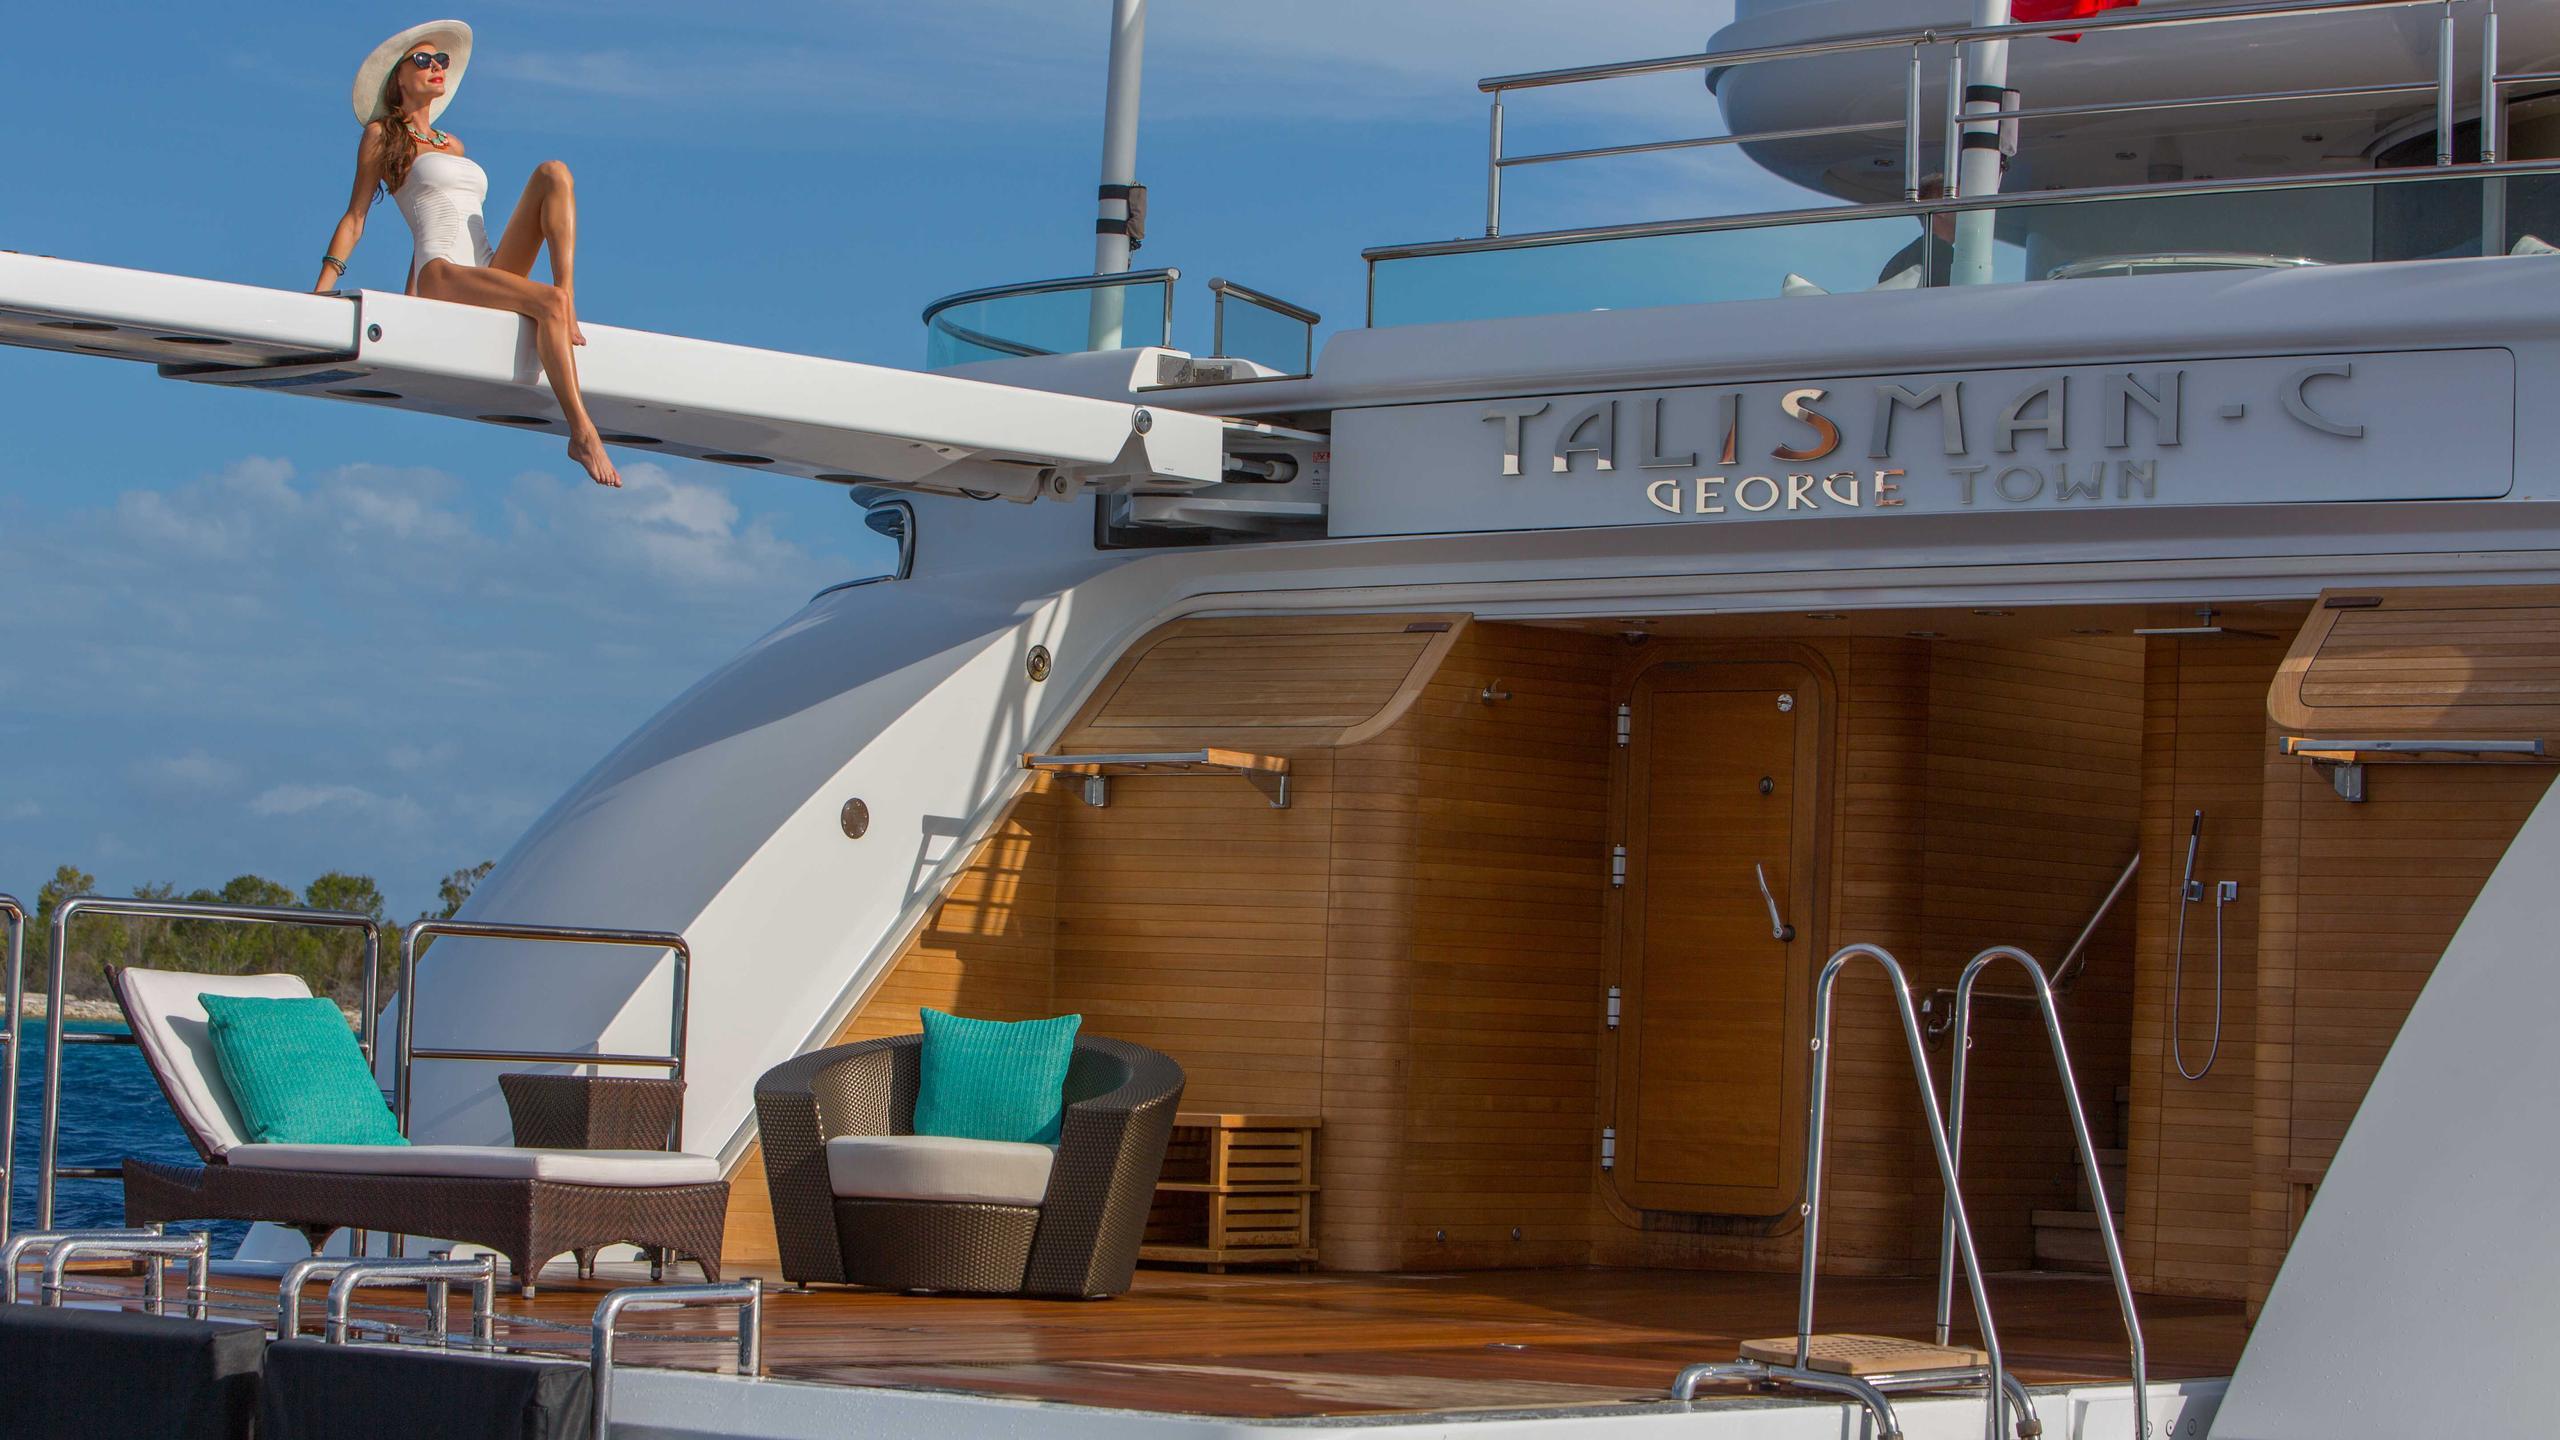 talisman-c-motor-yacht-Turquoise-2011-71m-beach-club